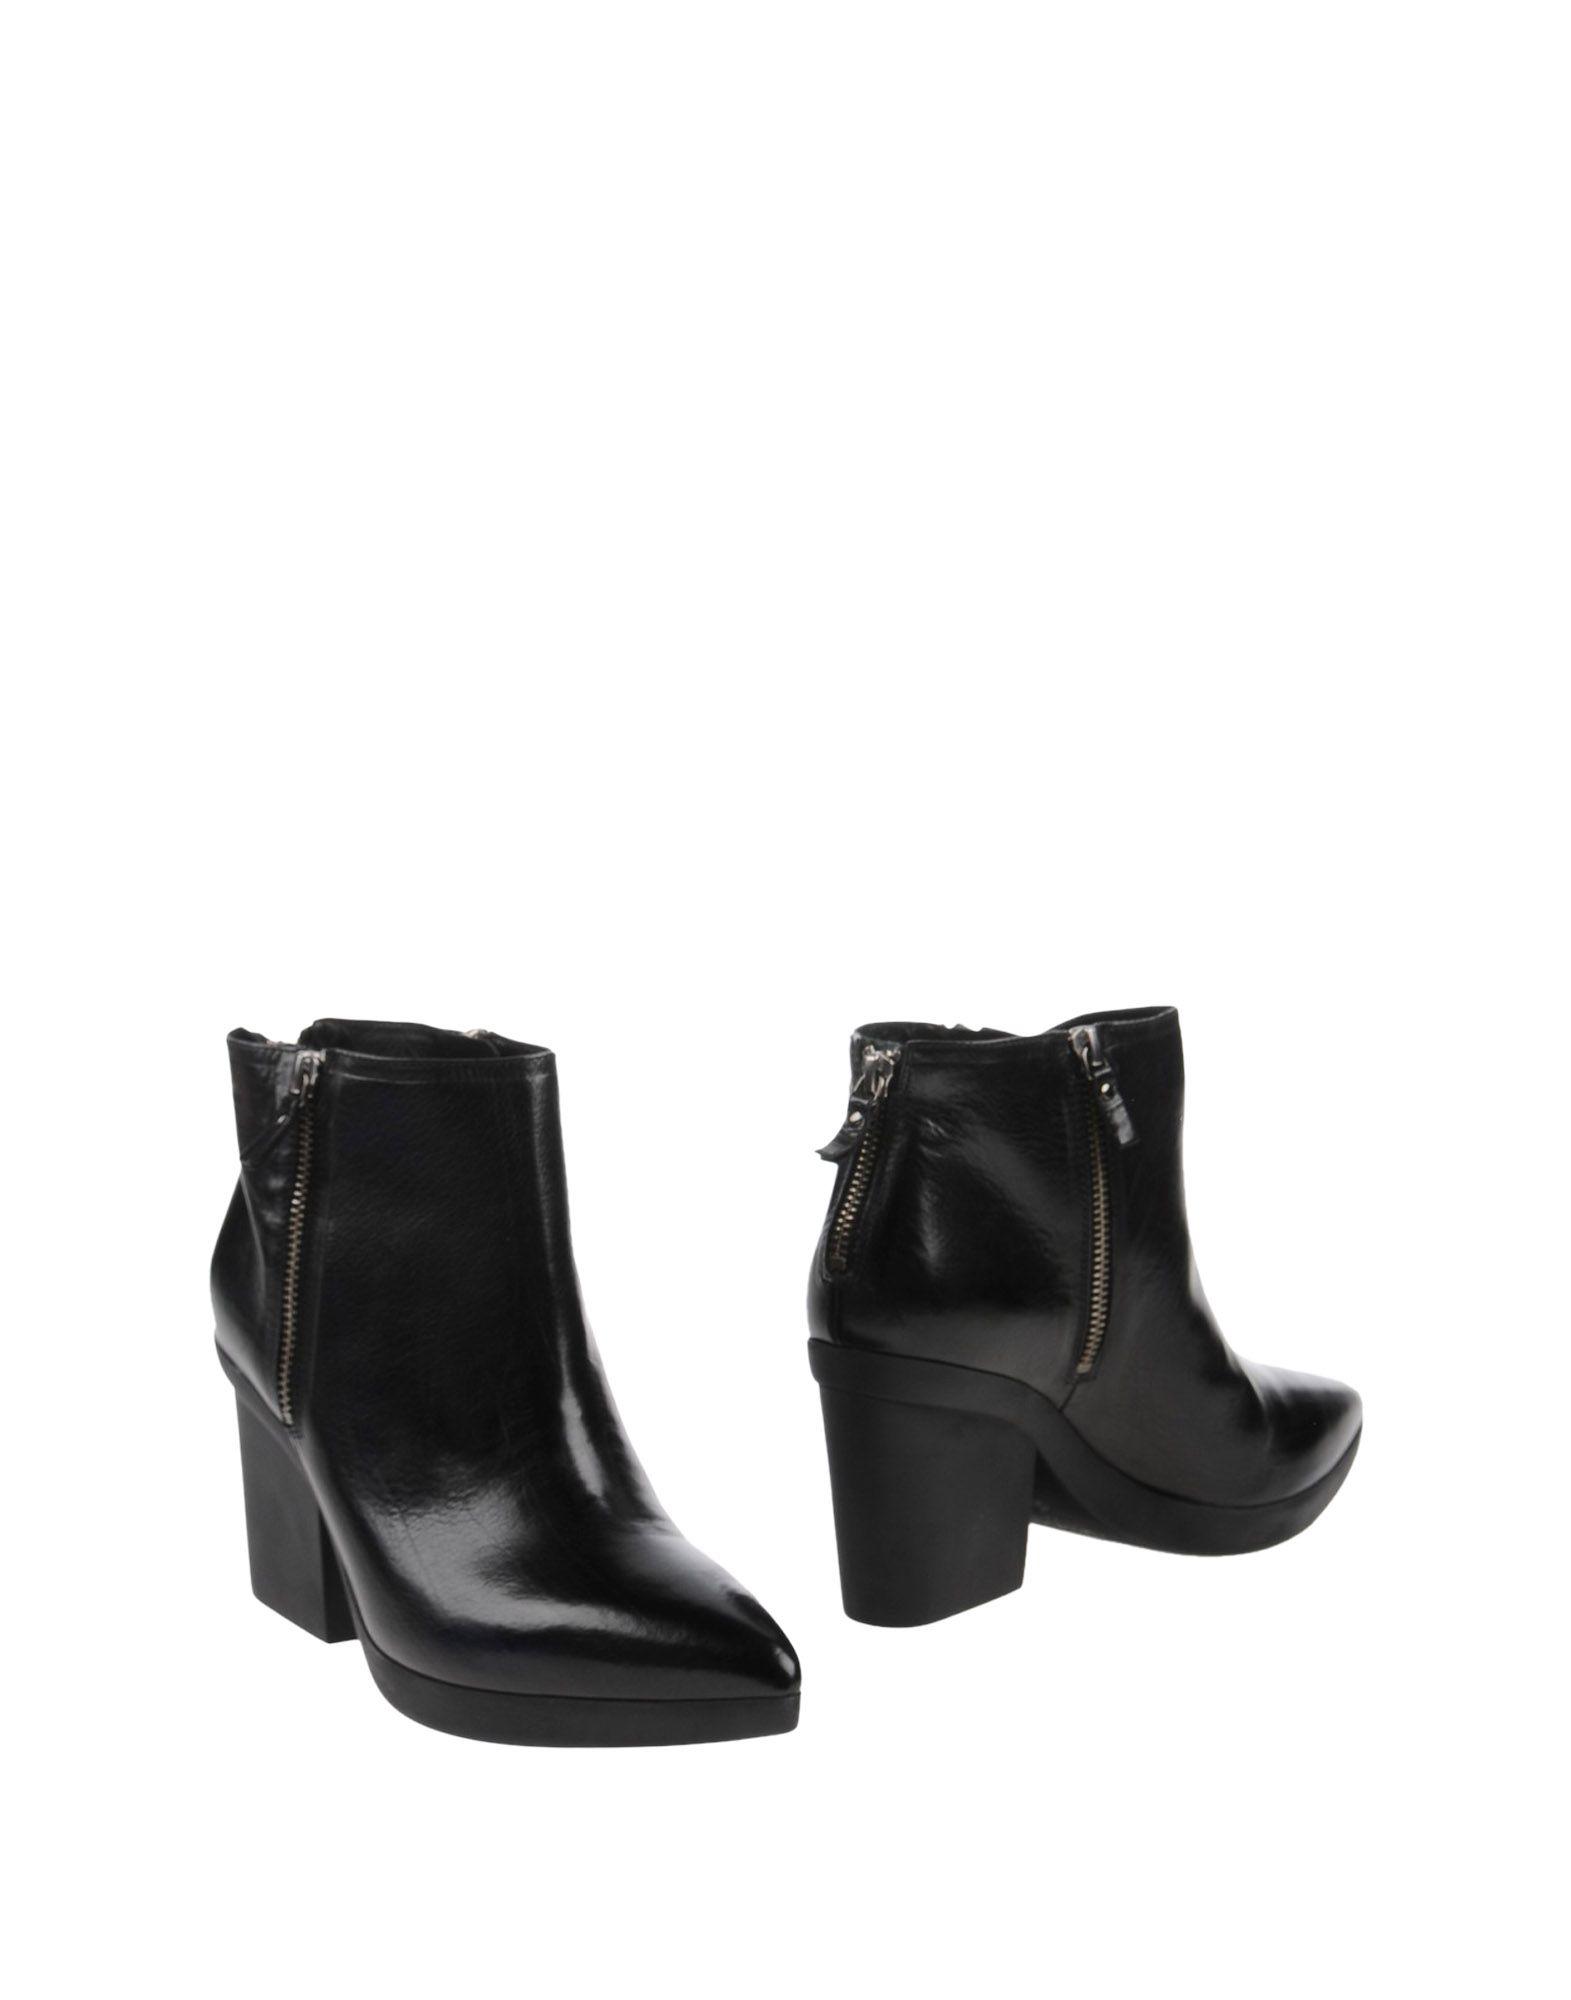 Stilvolle billige Schuhe Damen 87 Vic Matiē Stiefelette Damen Schuhe  11259866AH 5643f1